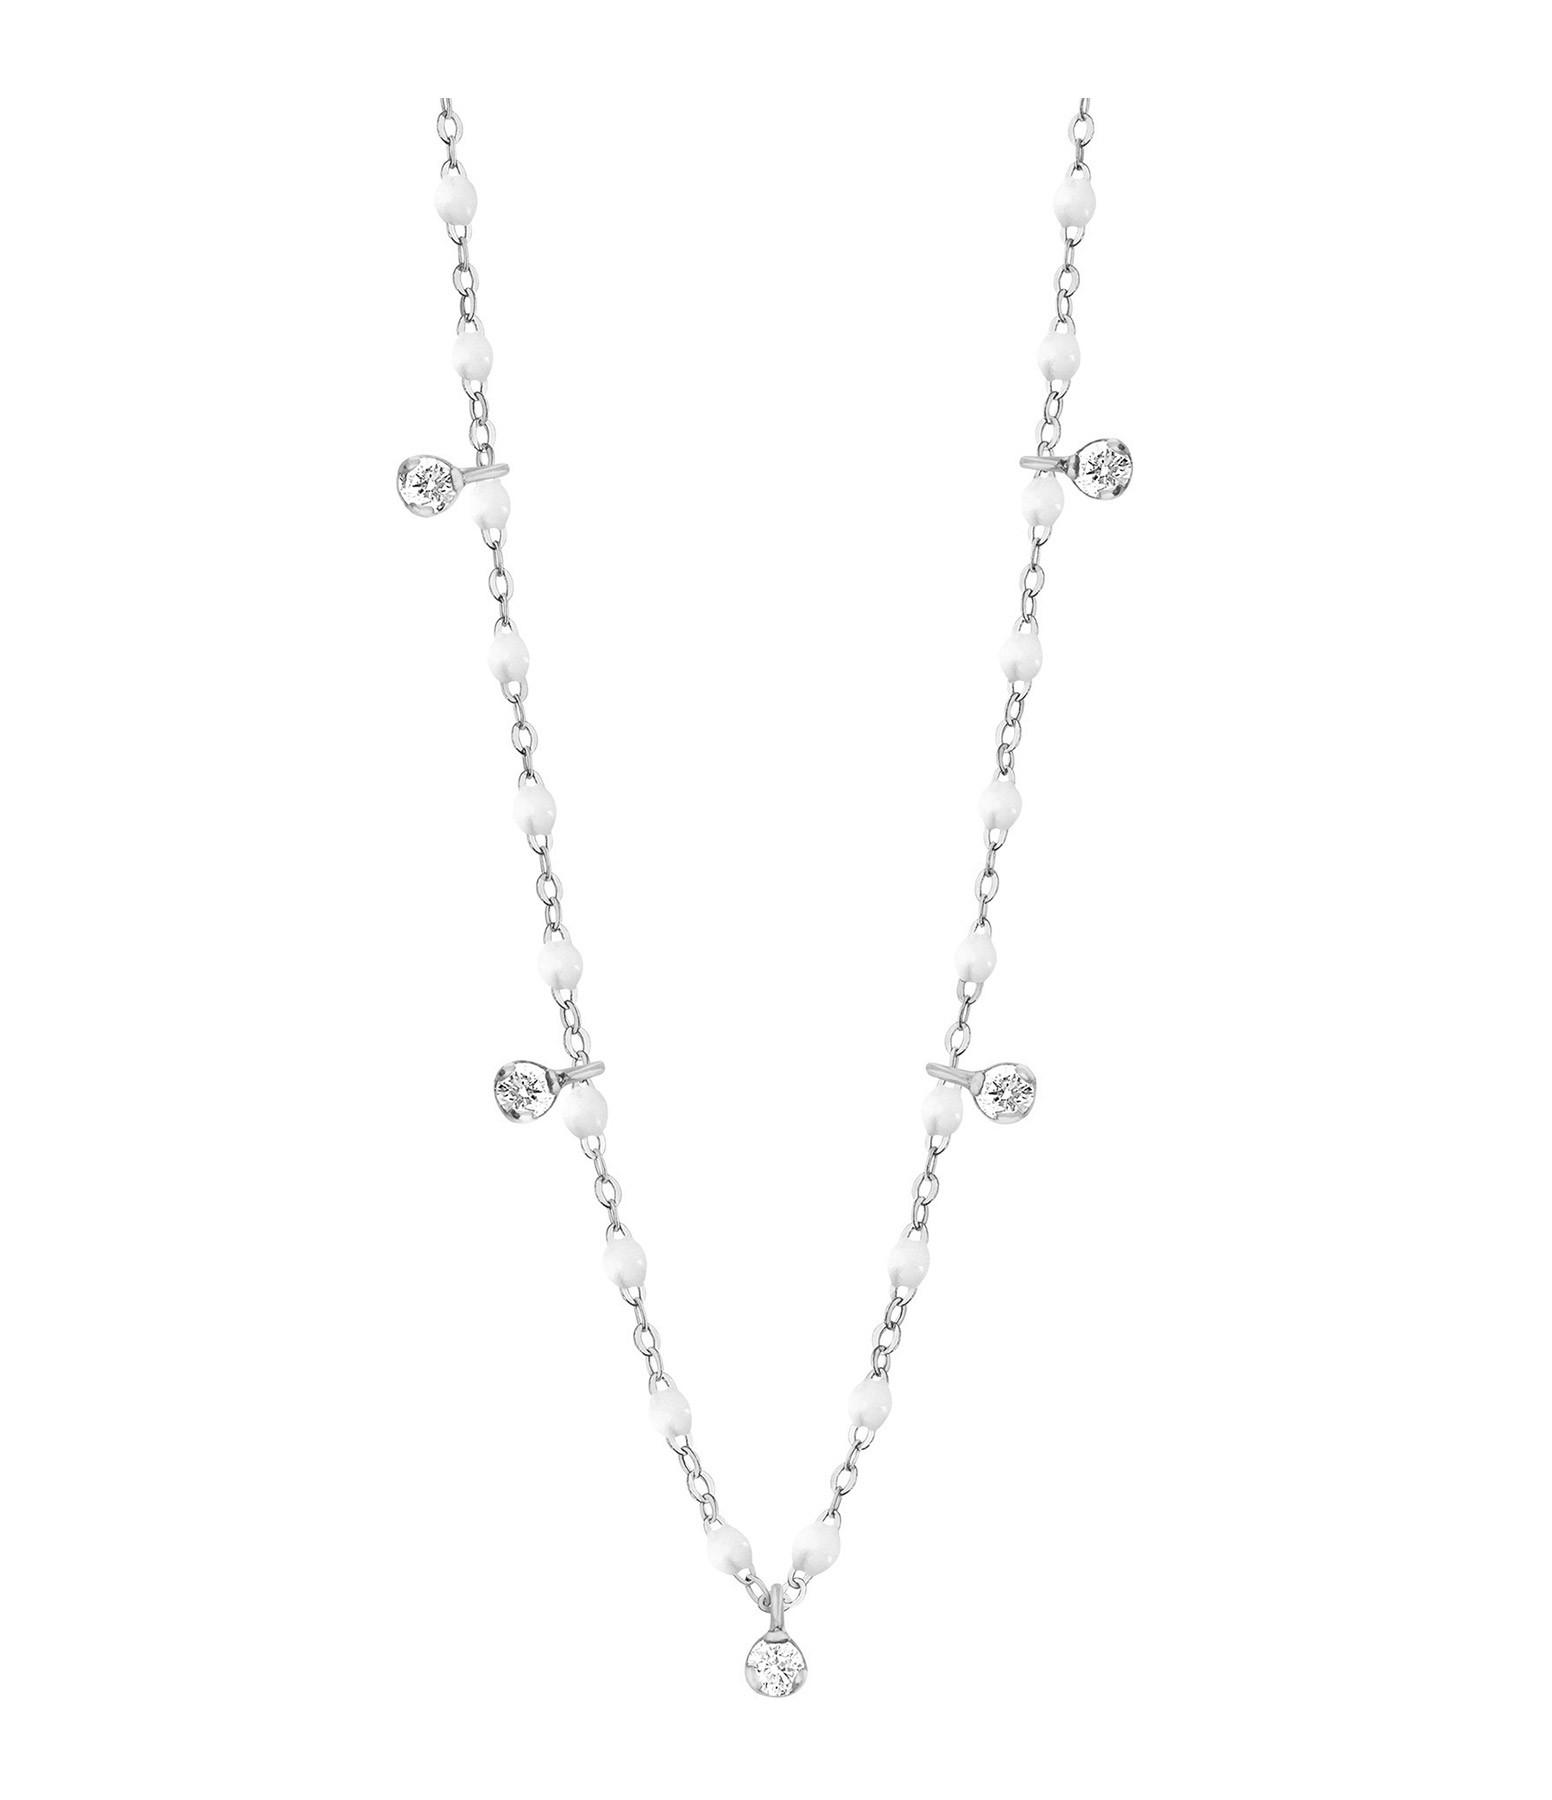 GIGI CLOZEAU - Collier résine Gigi Suprême 5 Diamants Or gris